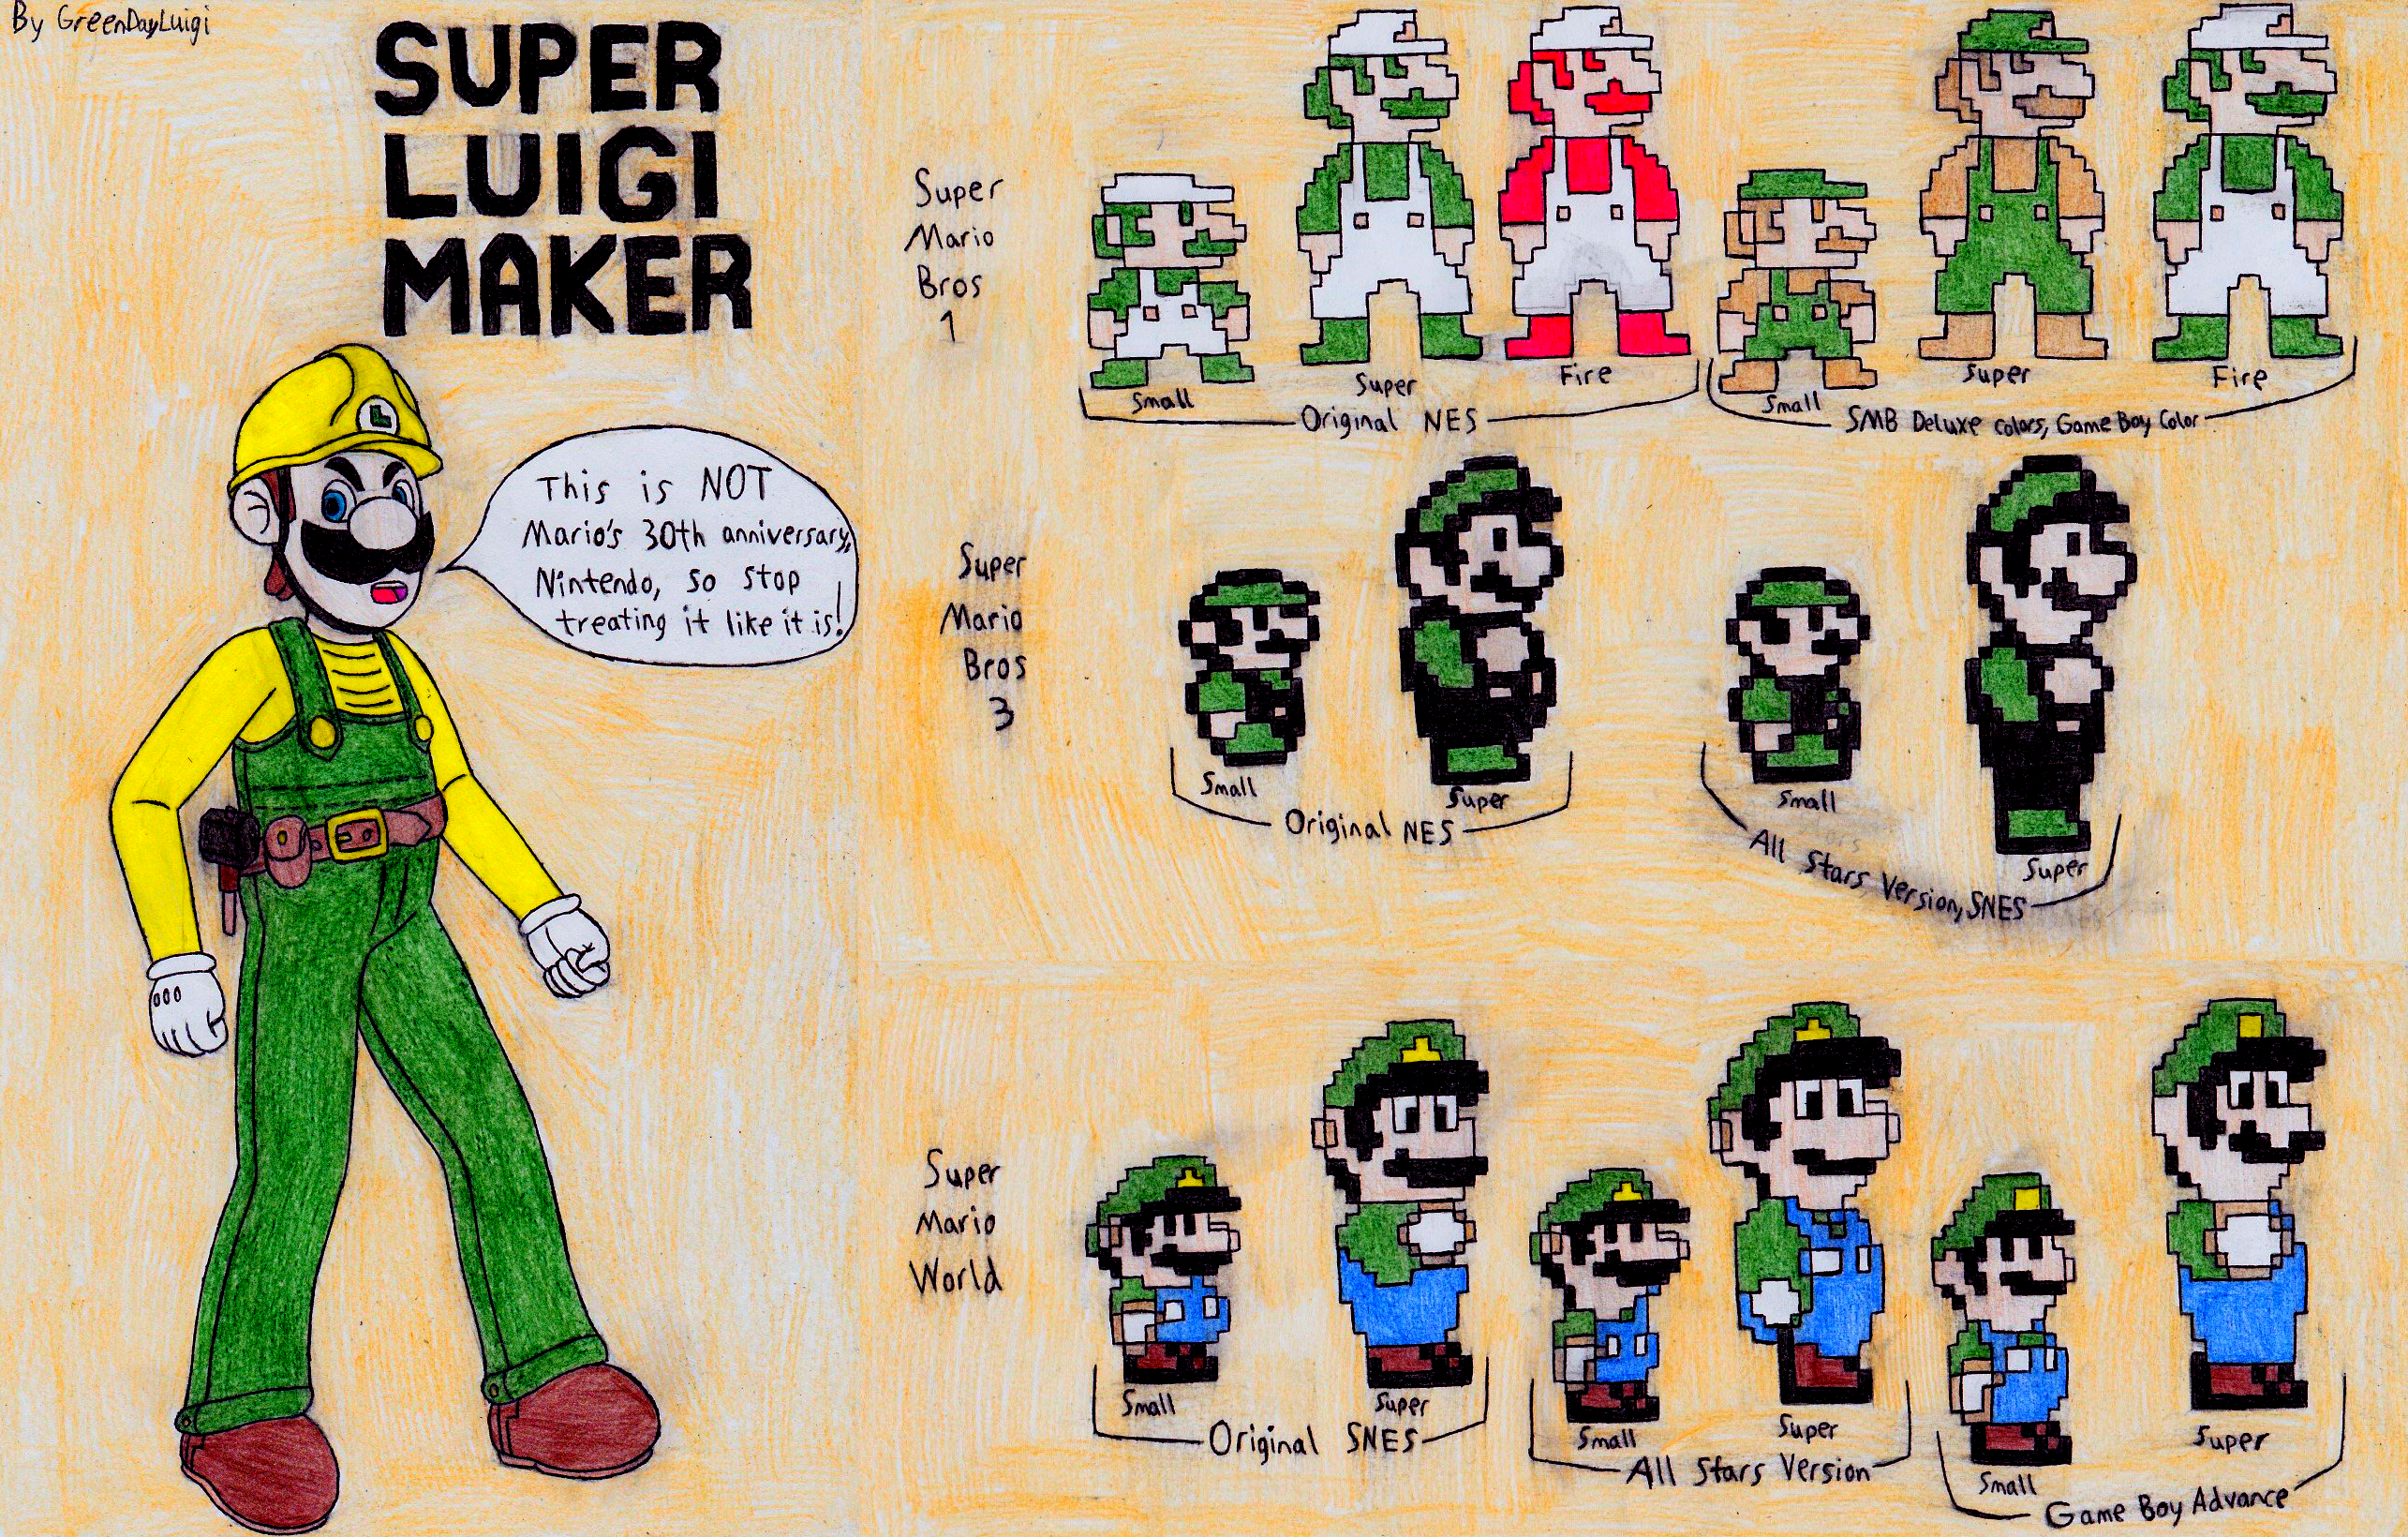 Luigi Sprites For Super Mario Maker By Greendayluigi On Deviantart